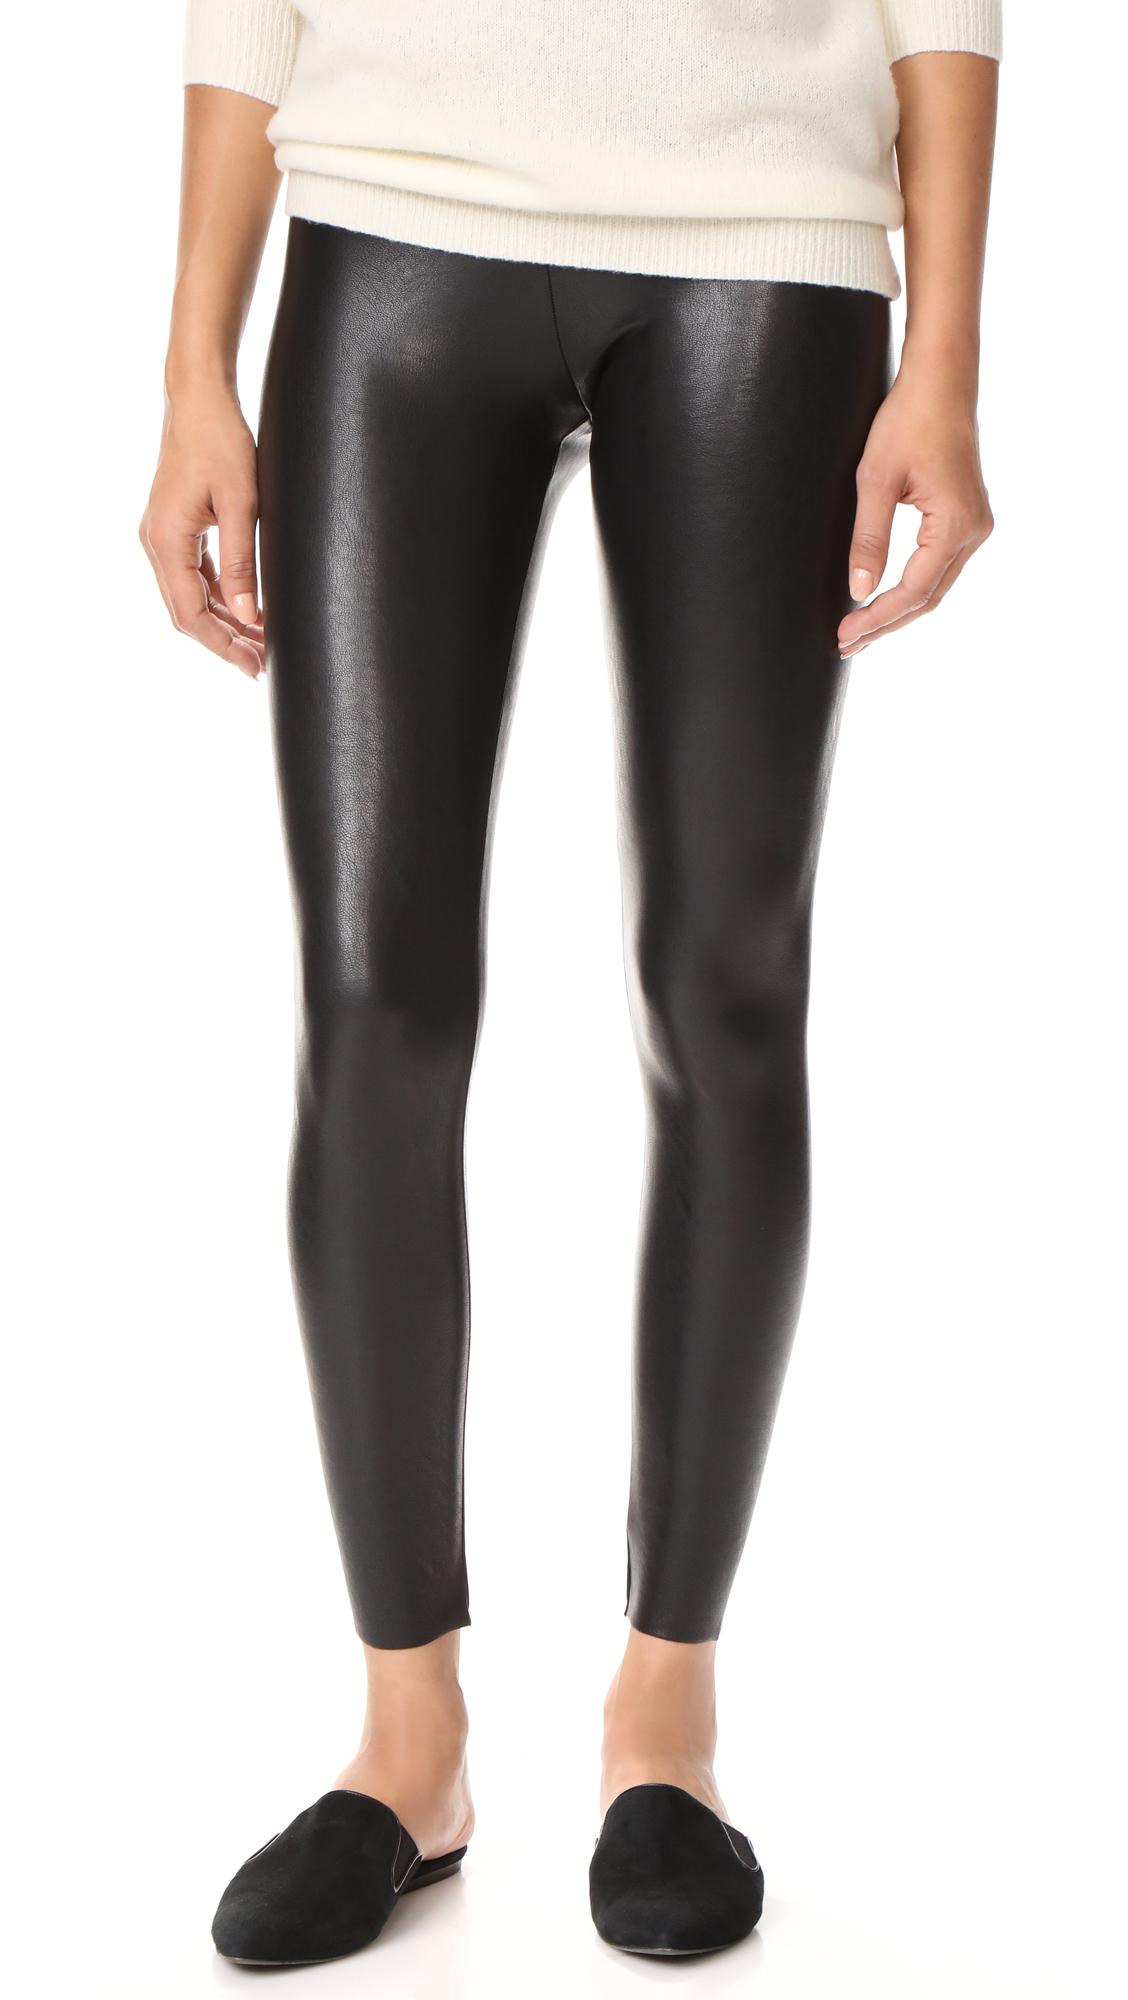 Commando Perfect Control Faux Leather Leggings - Black